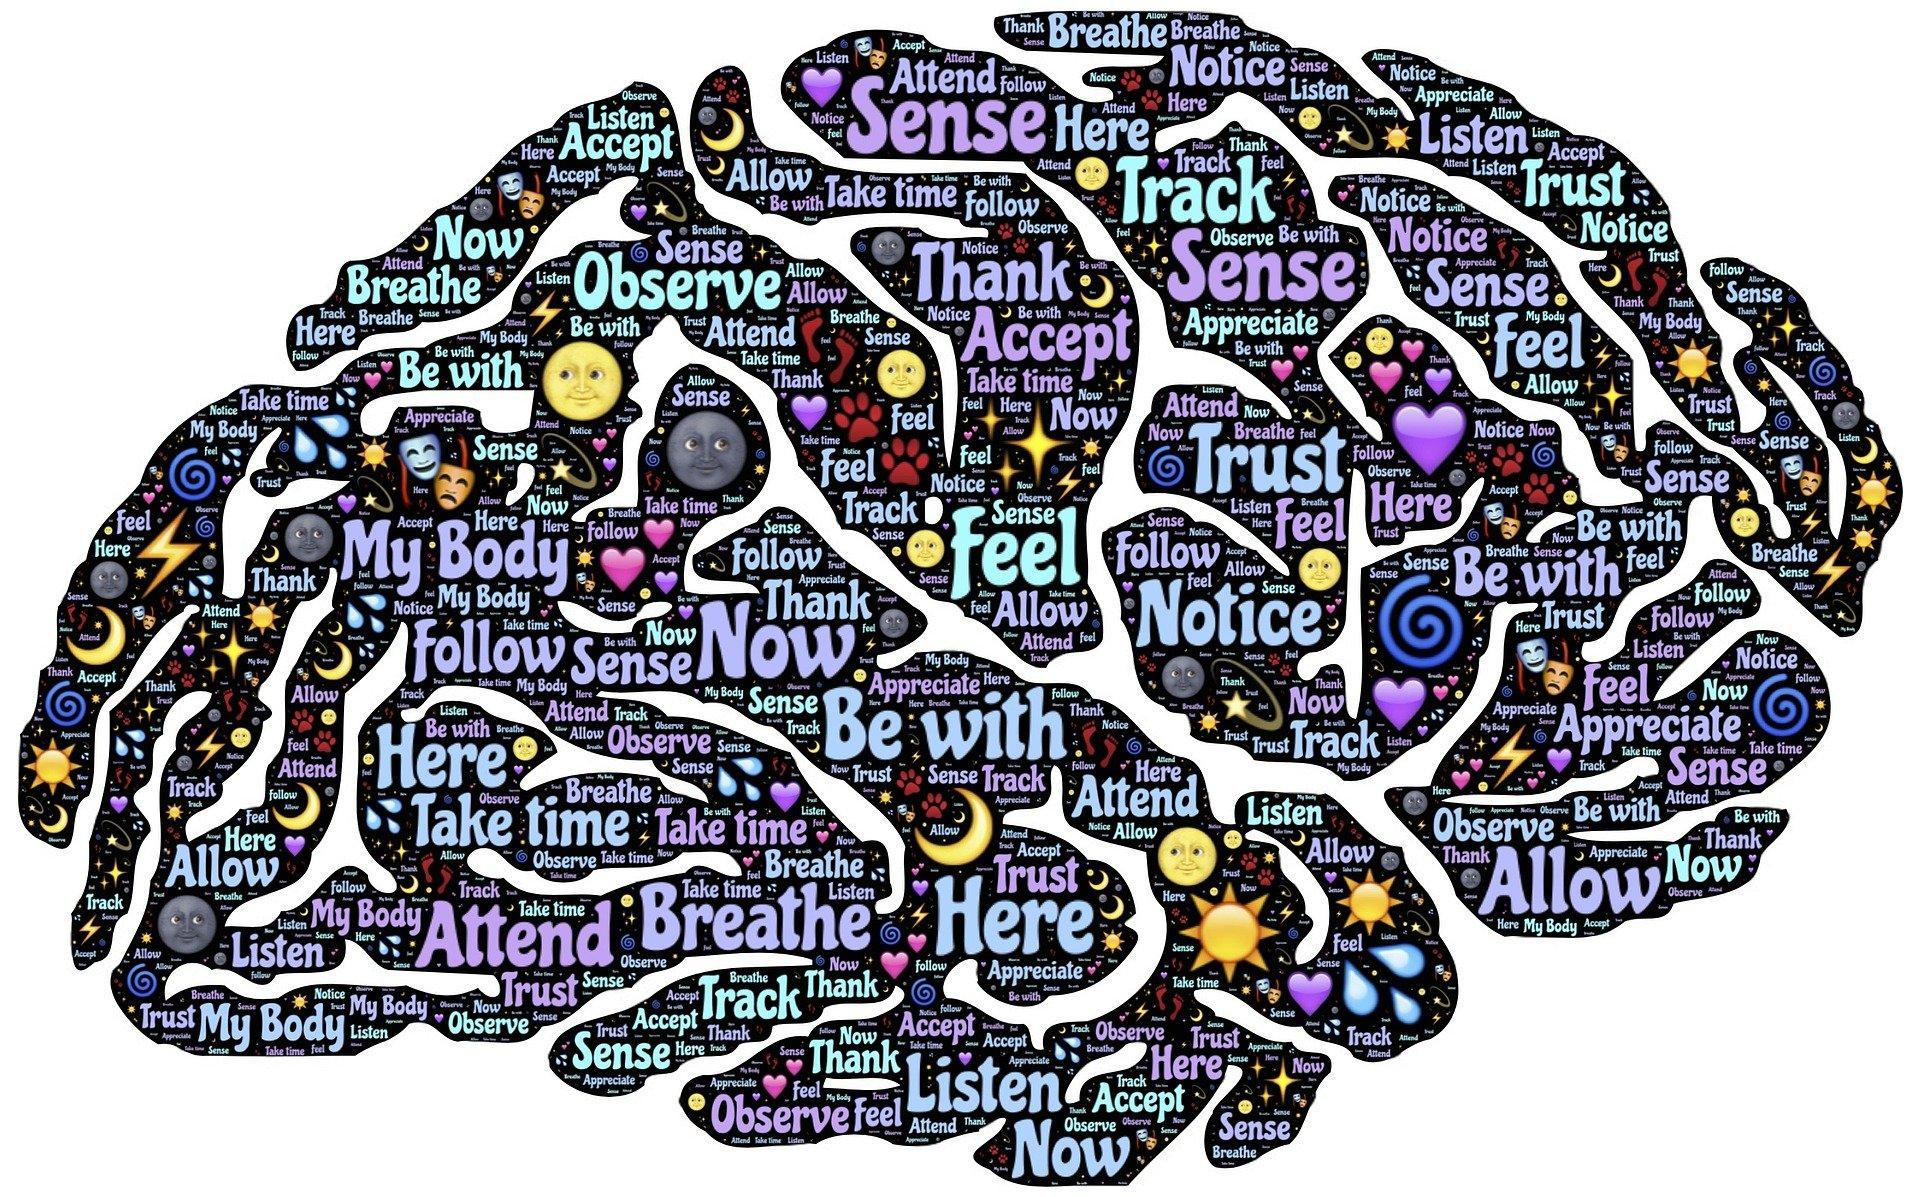 Meditar es sanar: bienvenidos al Mindfulness